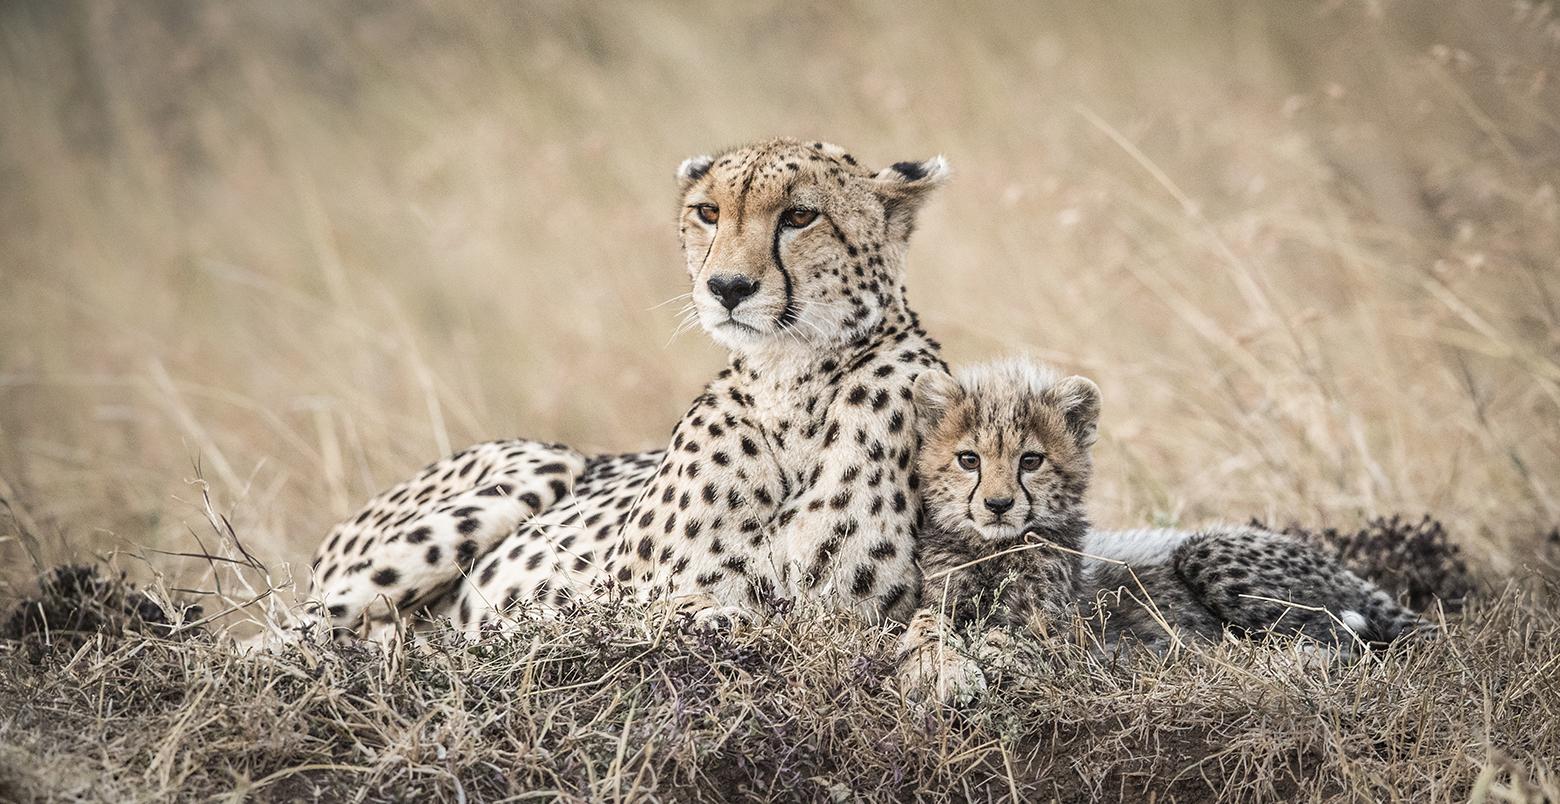 trai anfield photographic safaris -3596_